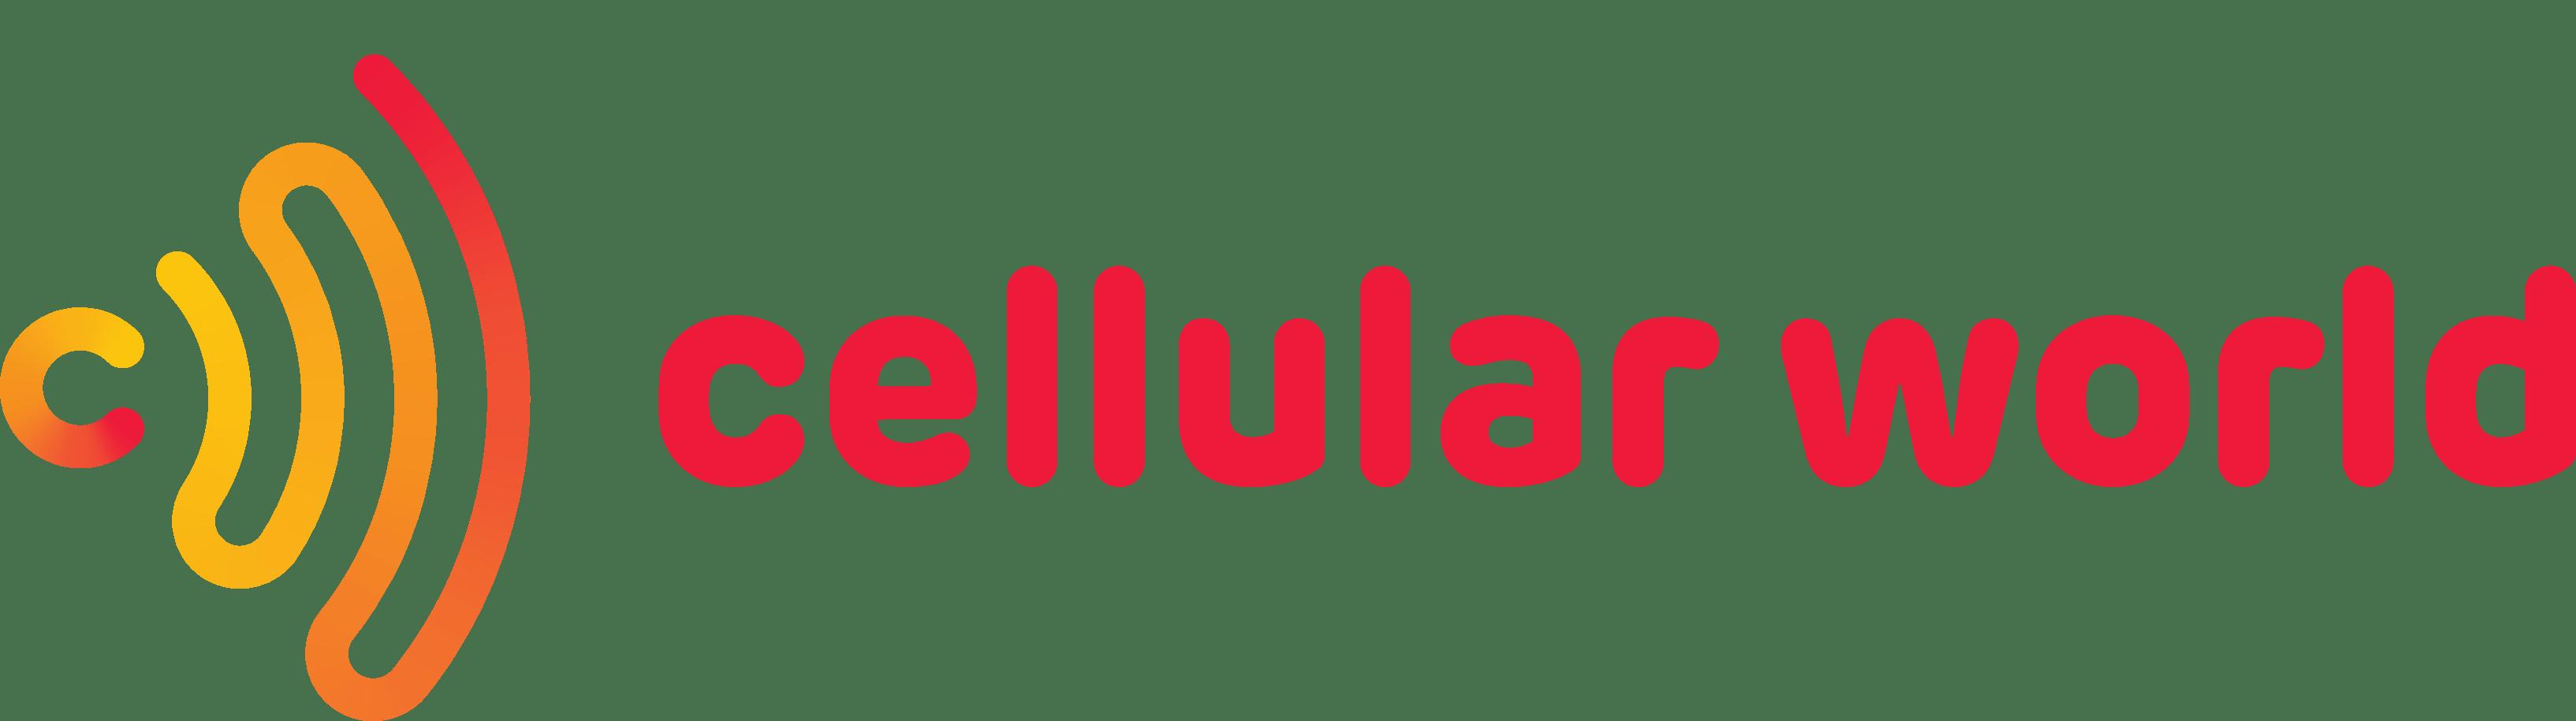 Cellular World